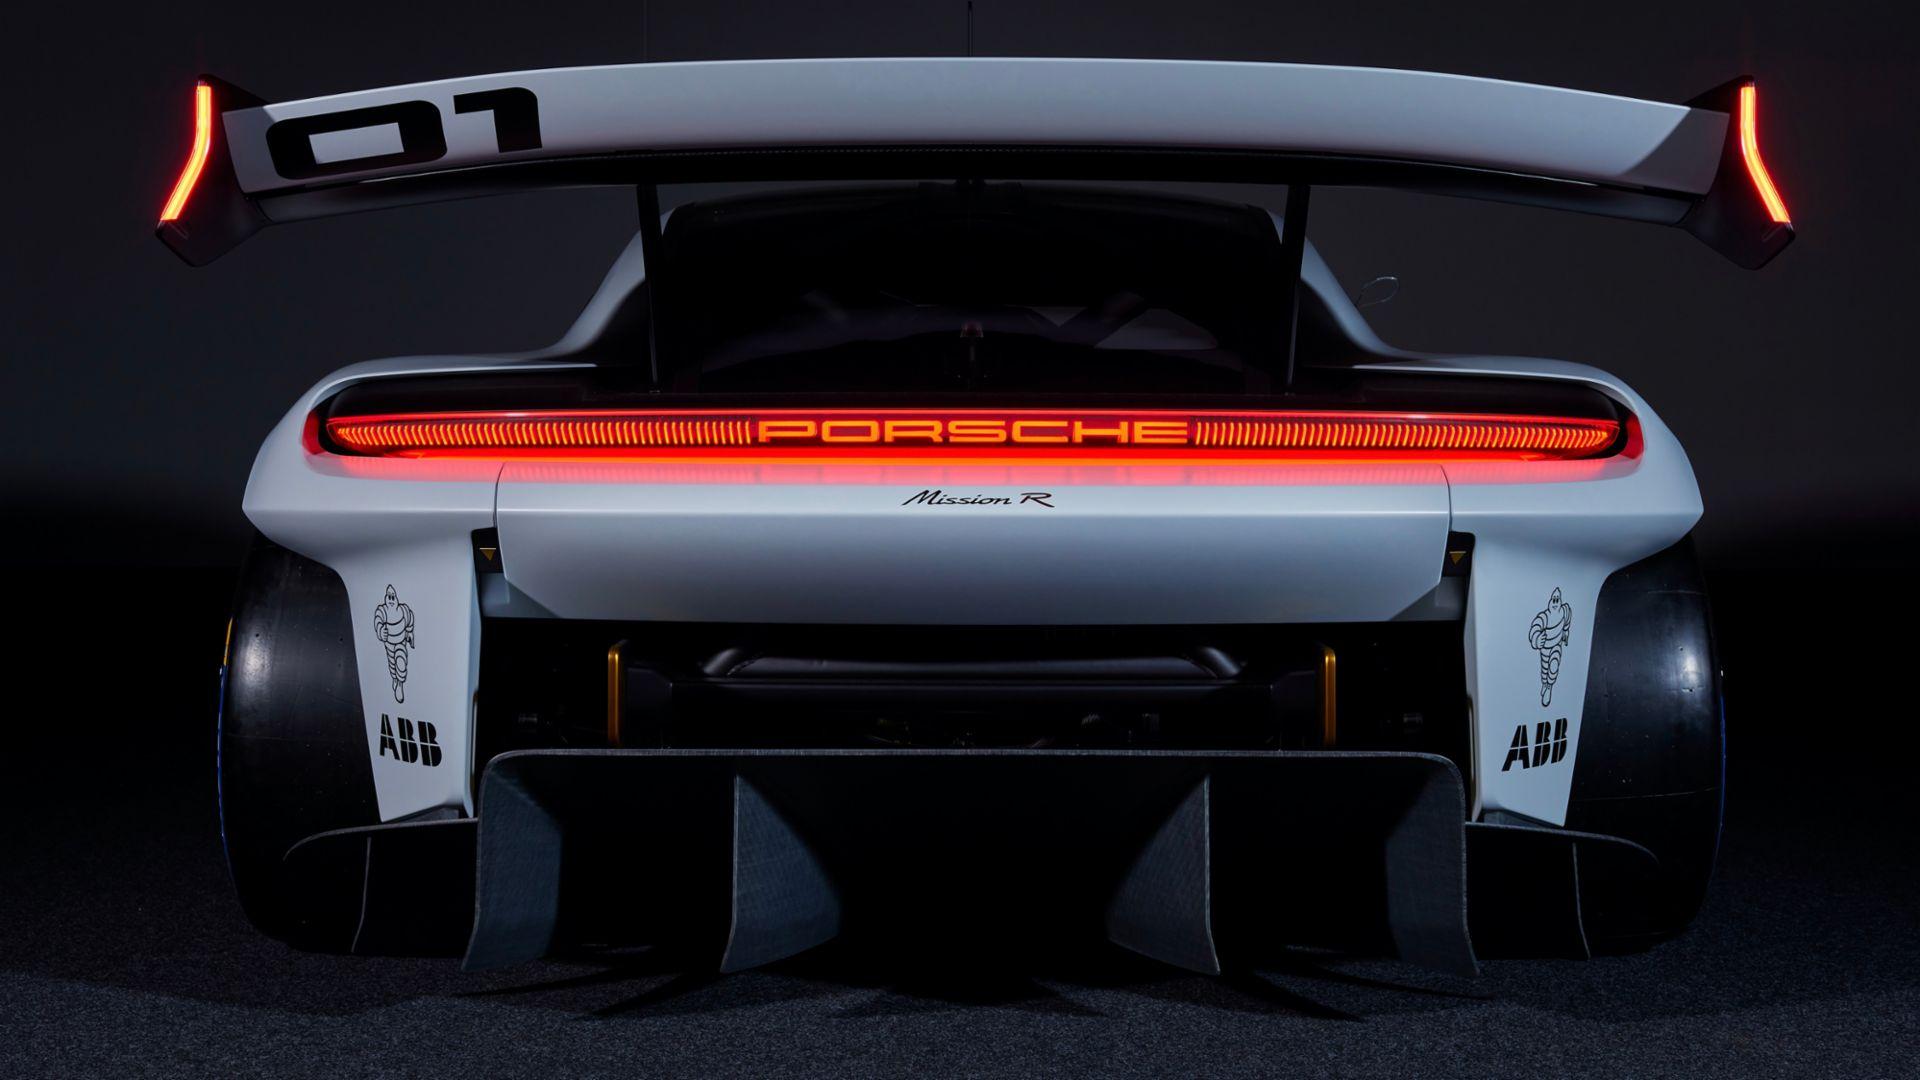 Porsche Mission R Gabungan Konsep Ramah Lingkungan & Performa